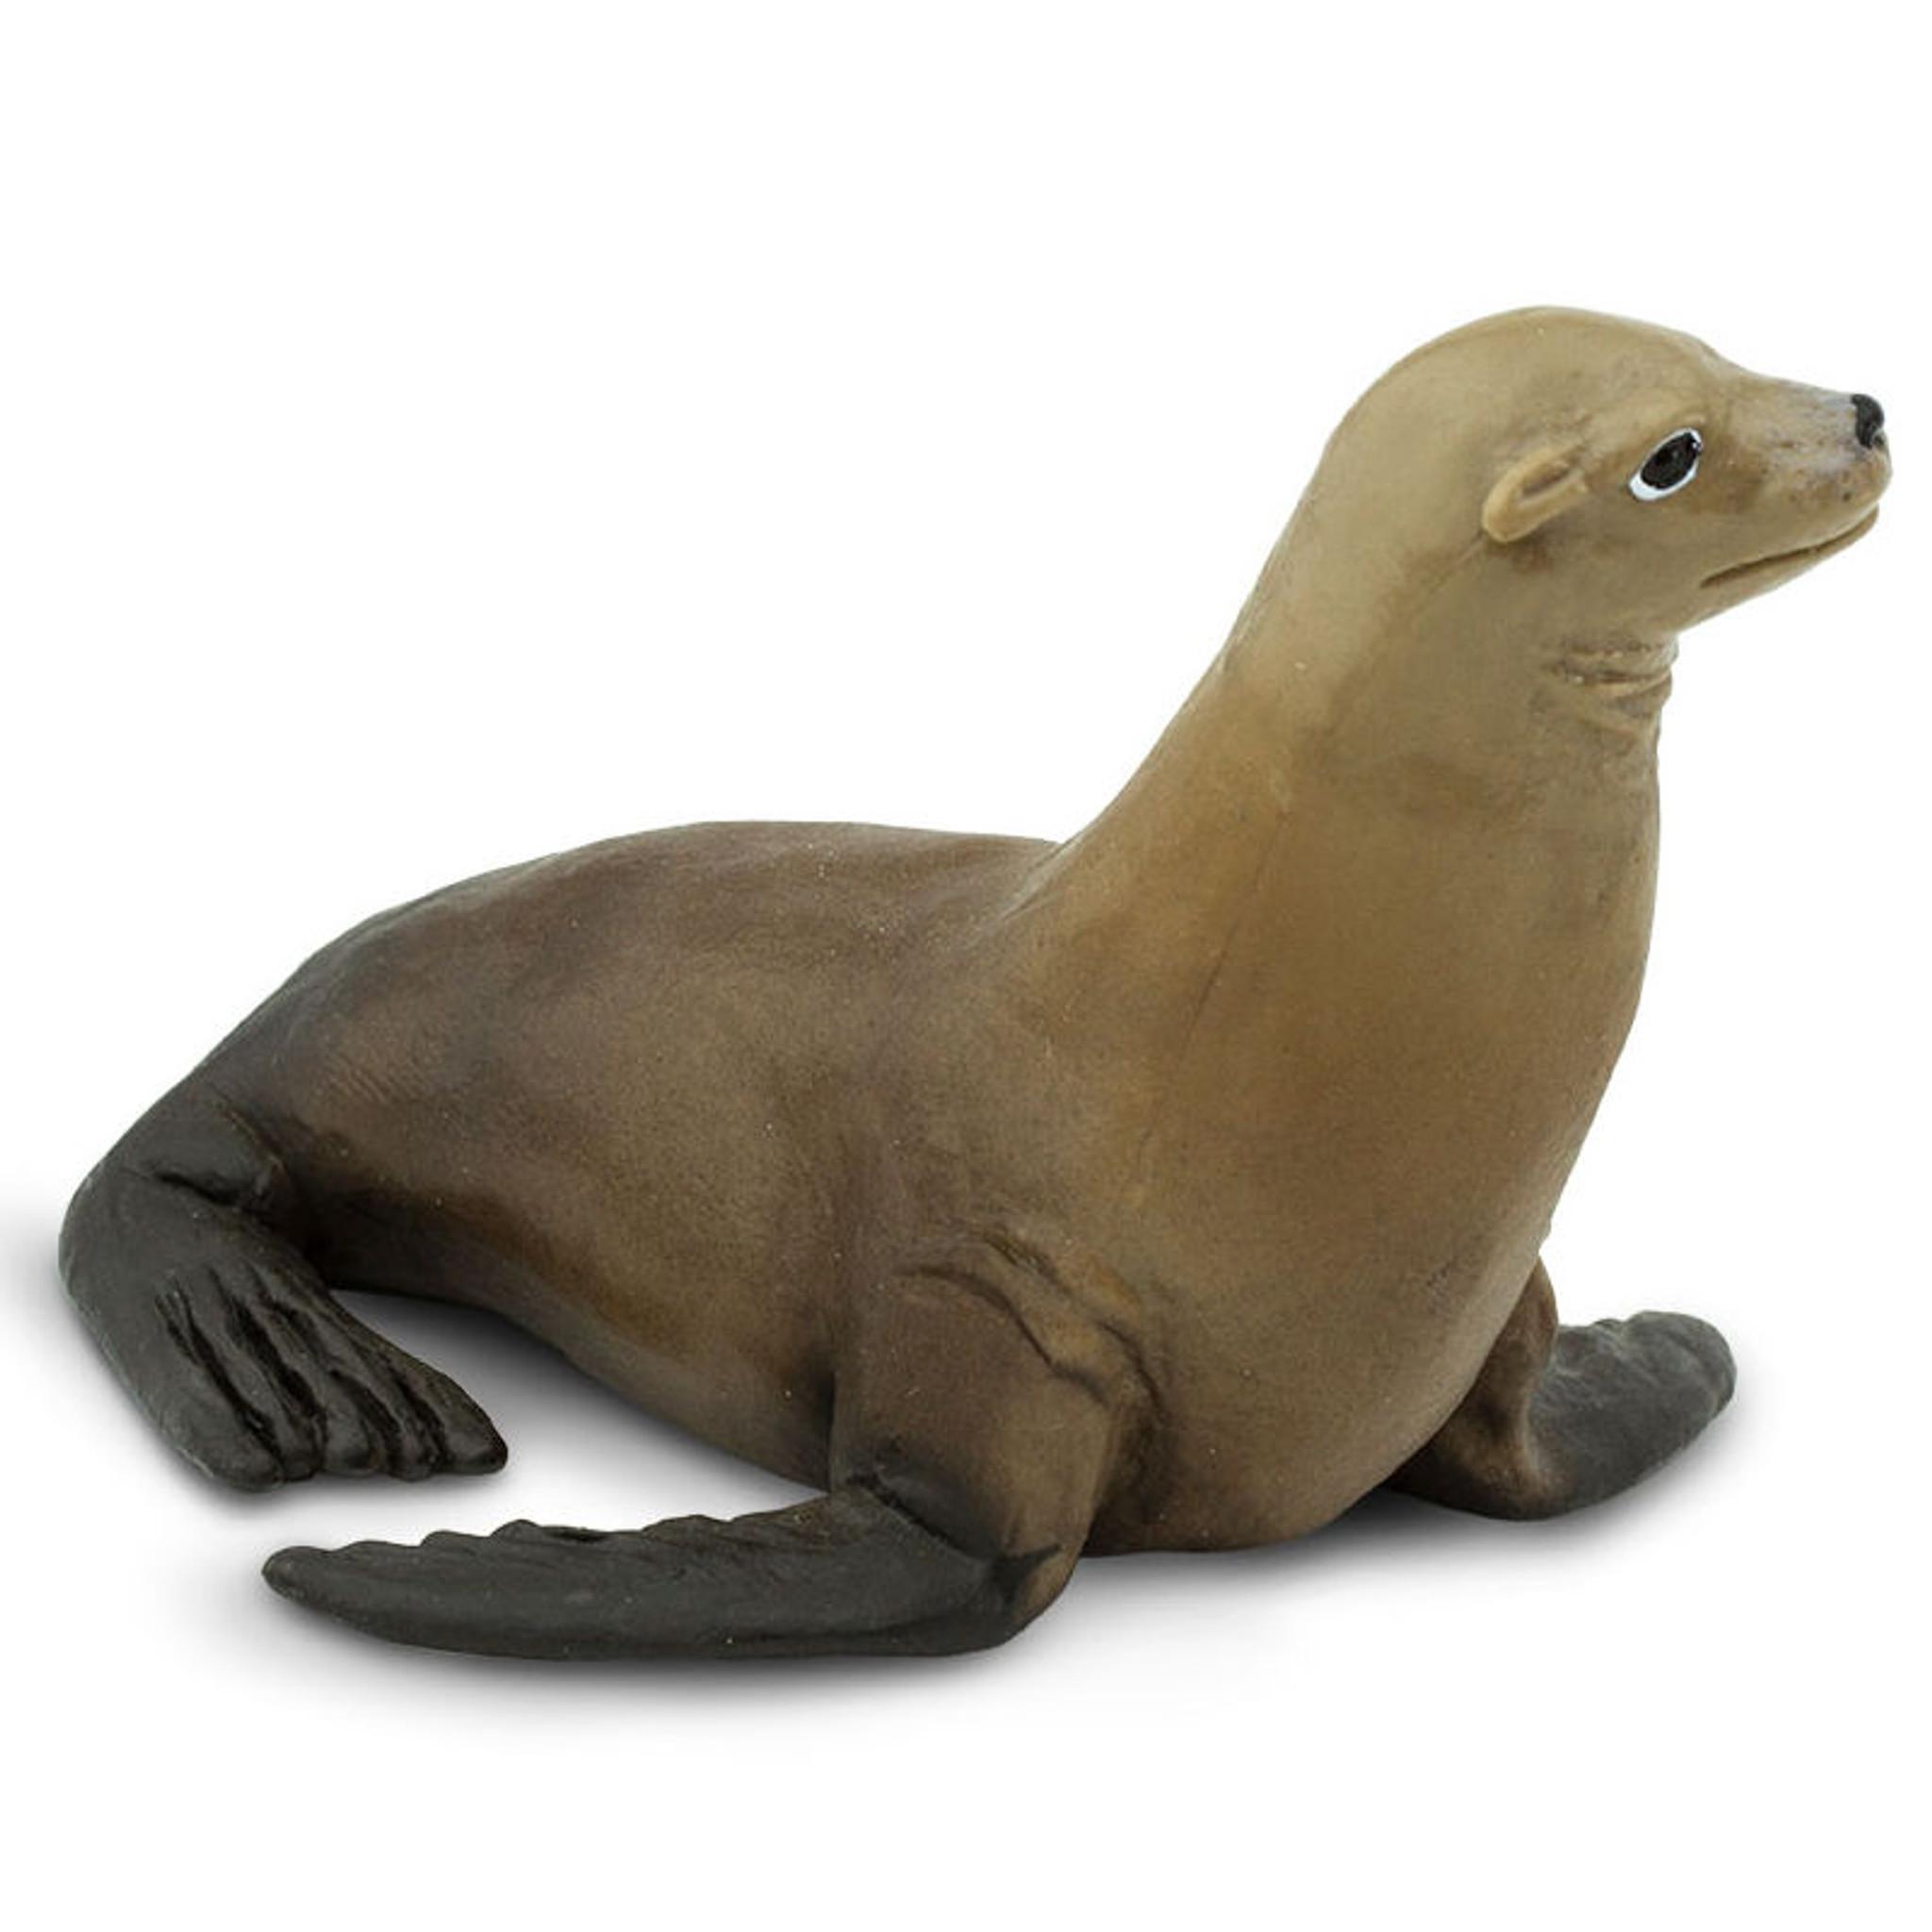 Safari Ltd. SeaLife 225029 Importaciôn león marino